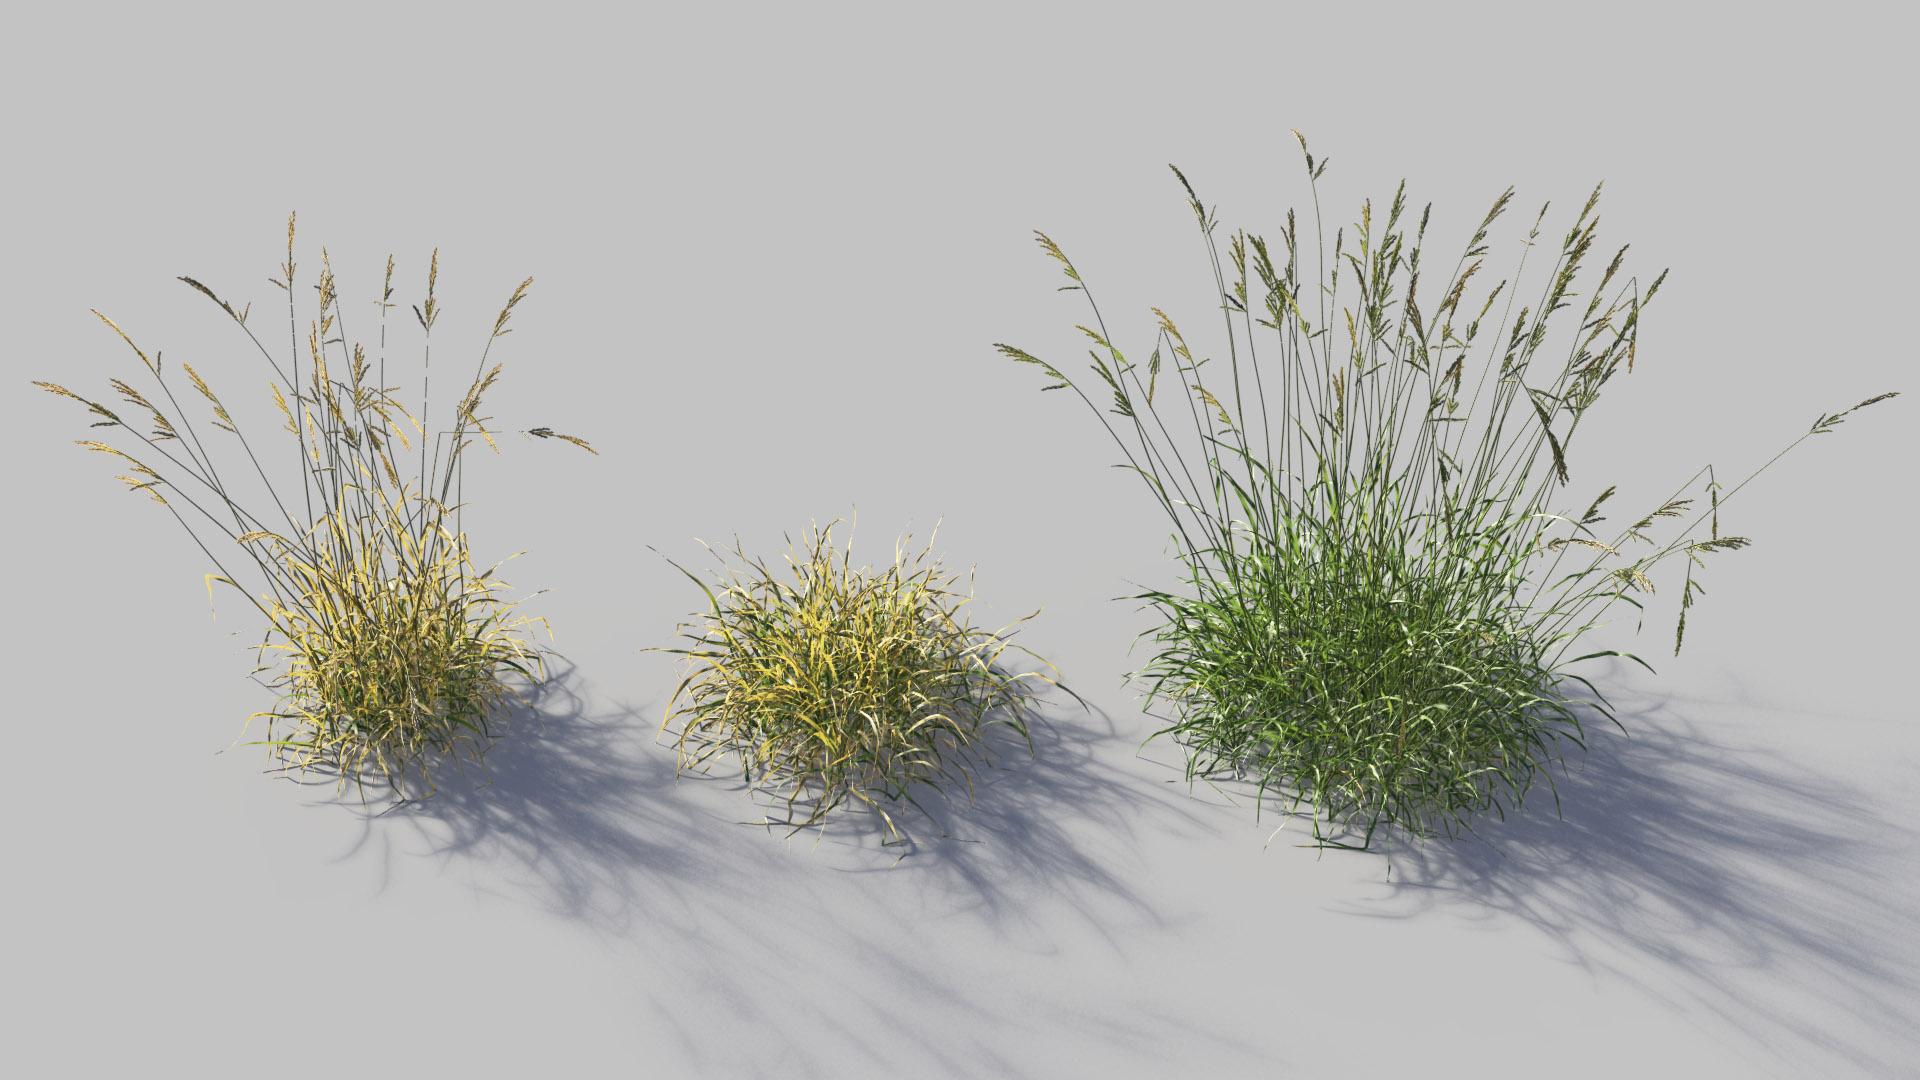 3D model of the Tall fescue Festuca arundinacea